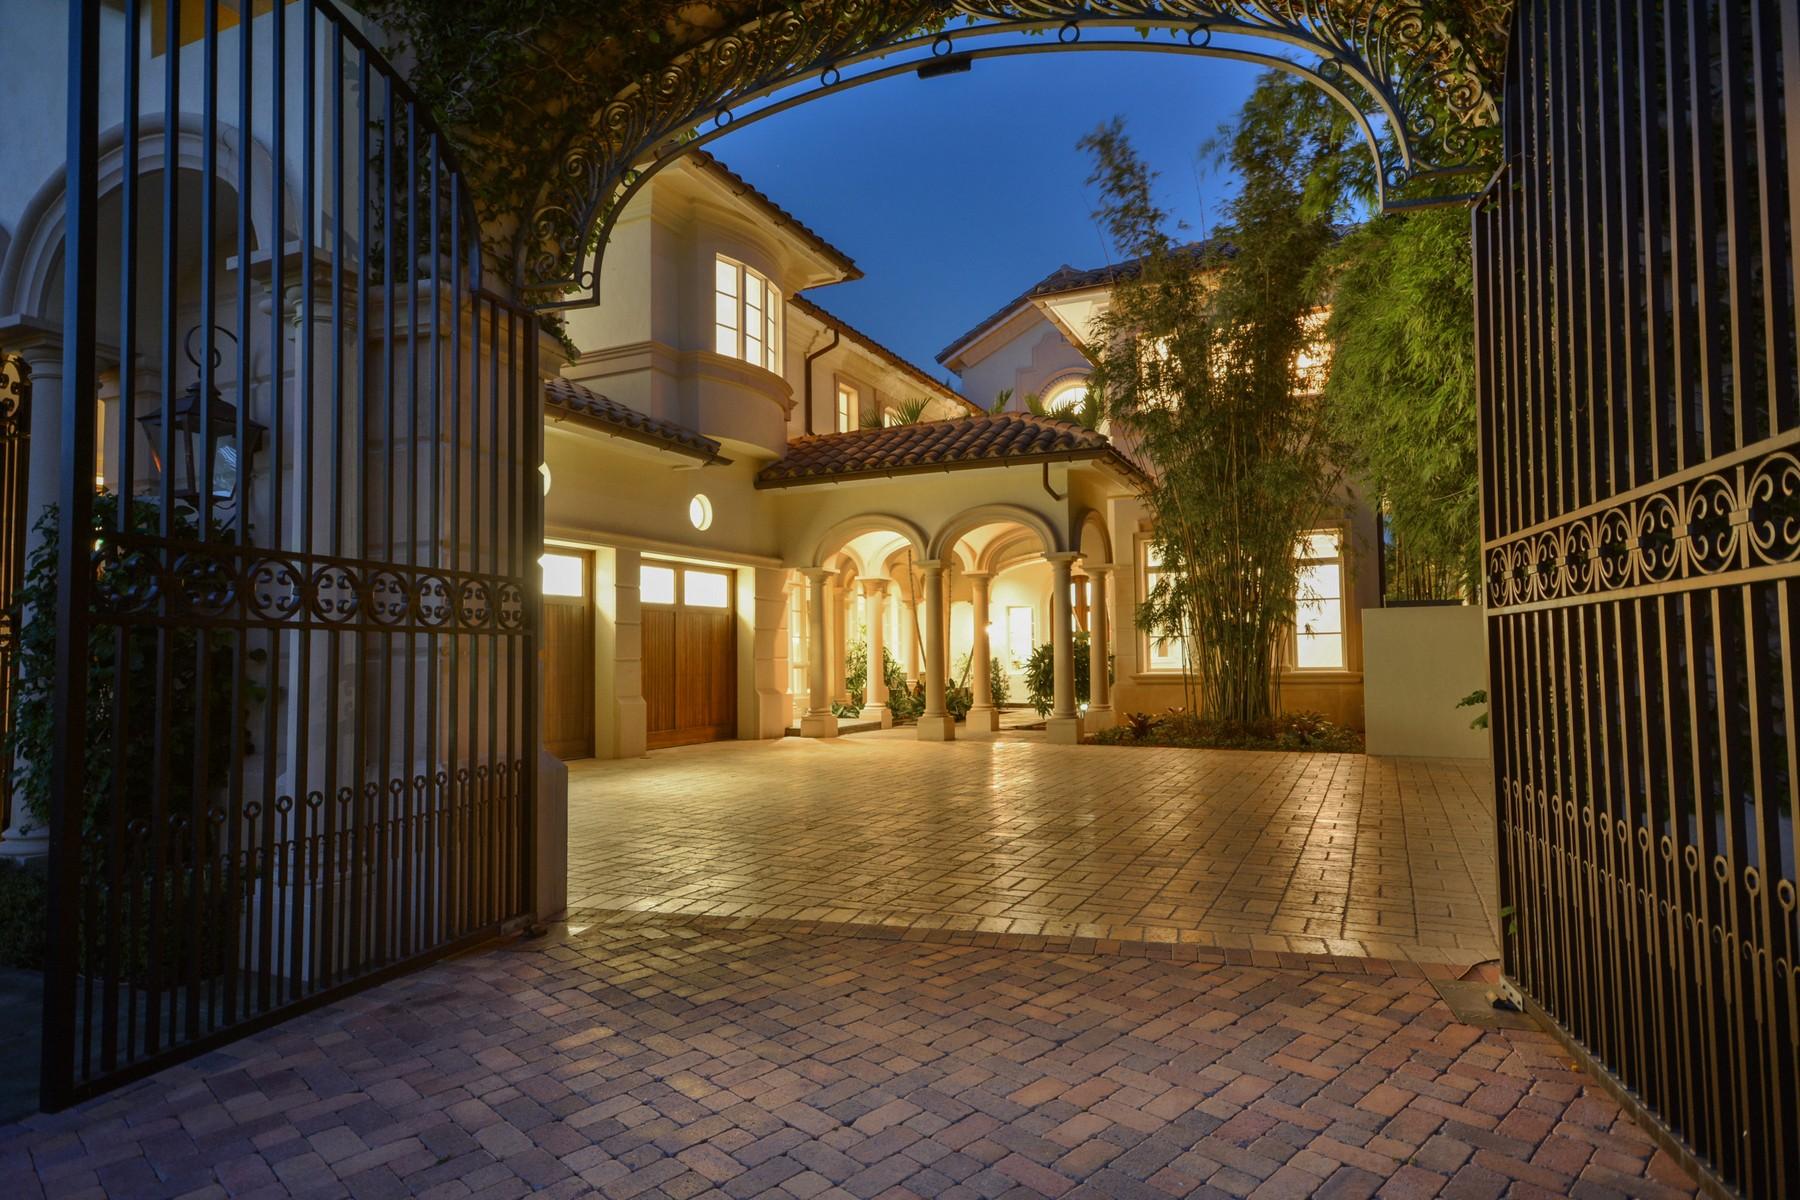 獨棟家庭住宅 為 出售 在 361 SE Mizner Lake Estates Dr , Boca Raton, FL 334 Boca Raton, 佛羅里達州, 33432 美國